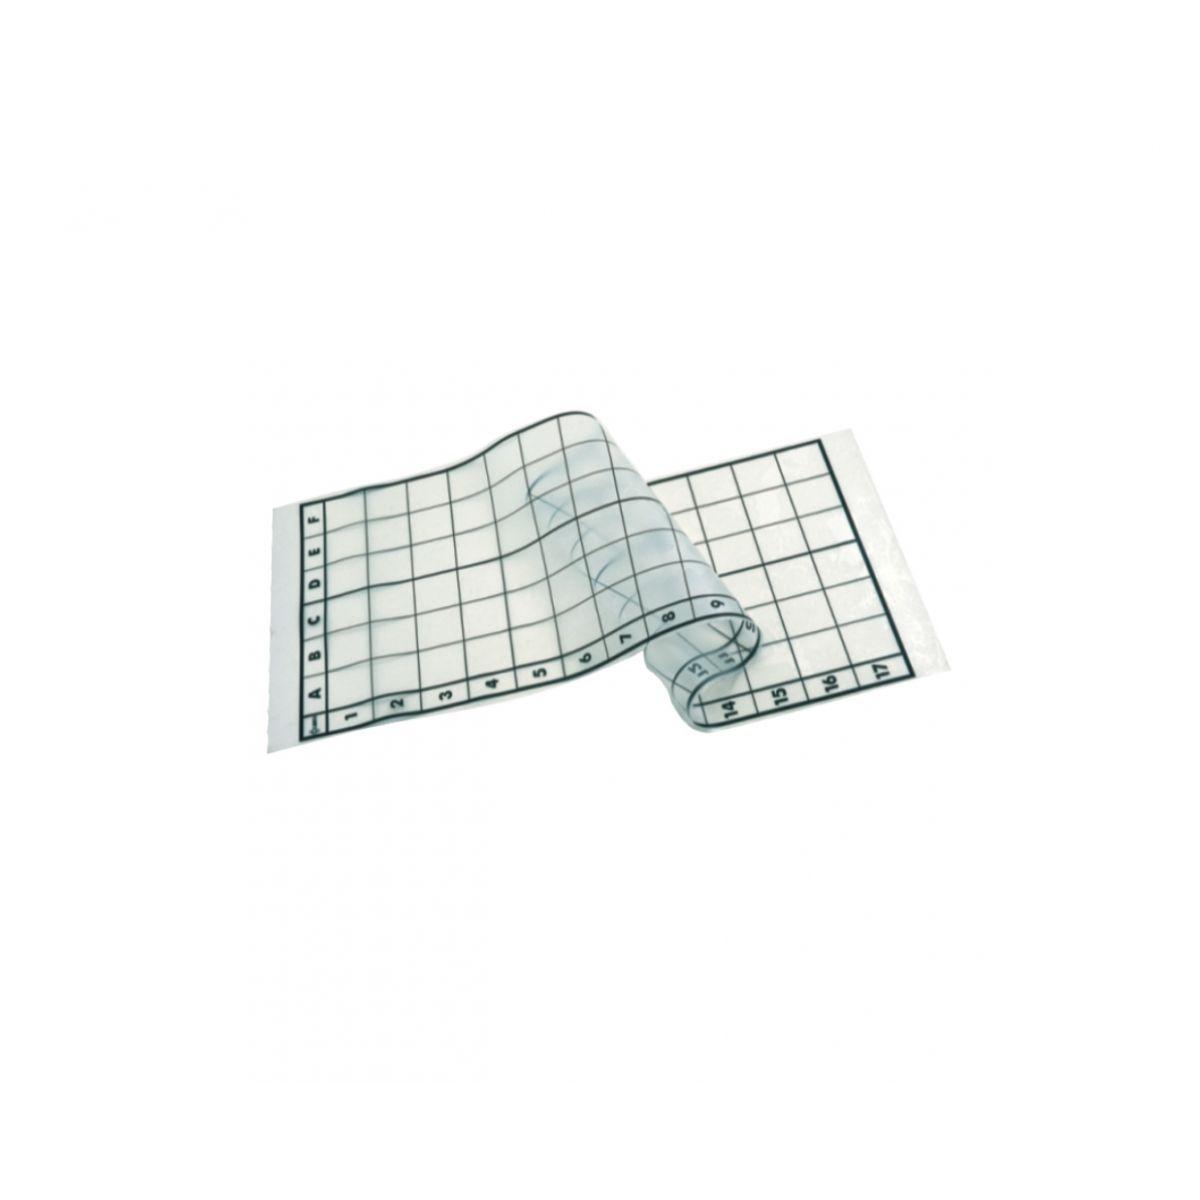 Simetrógrafo postural portátil de parede - 6505